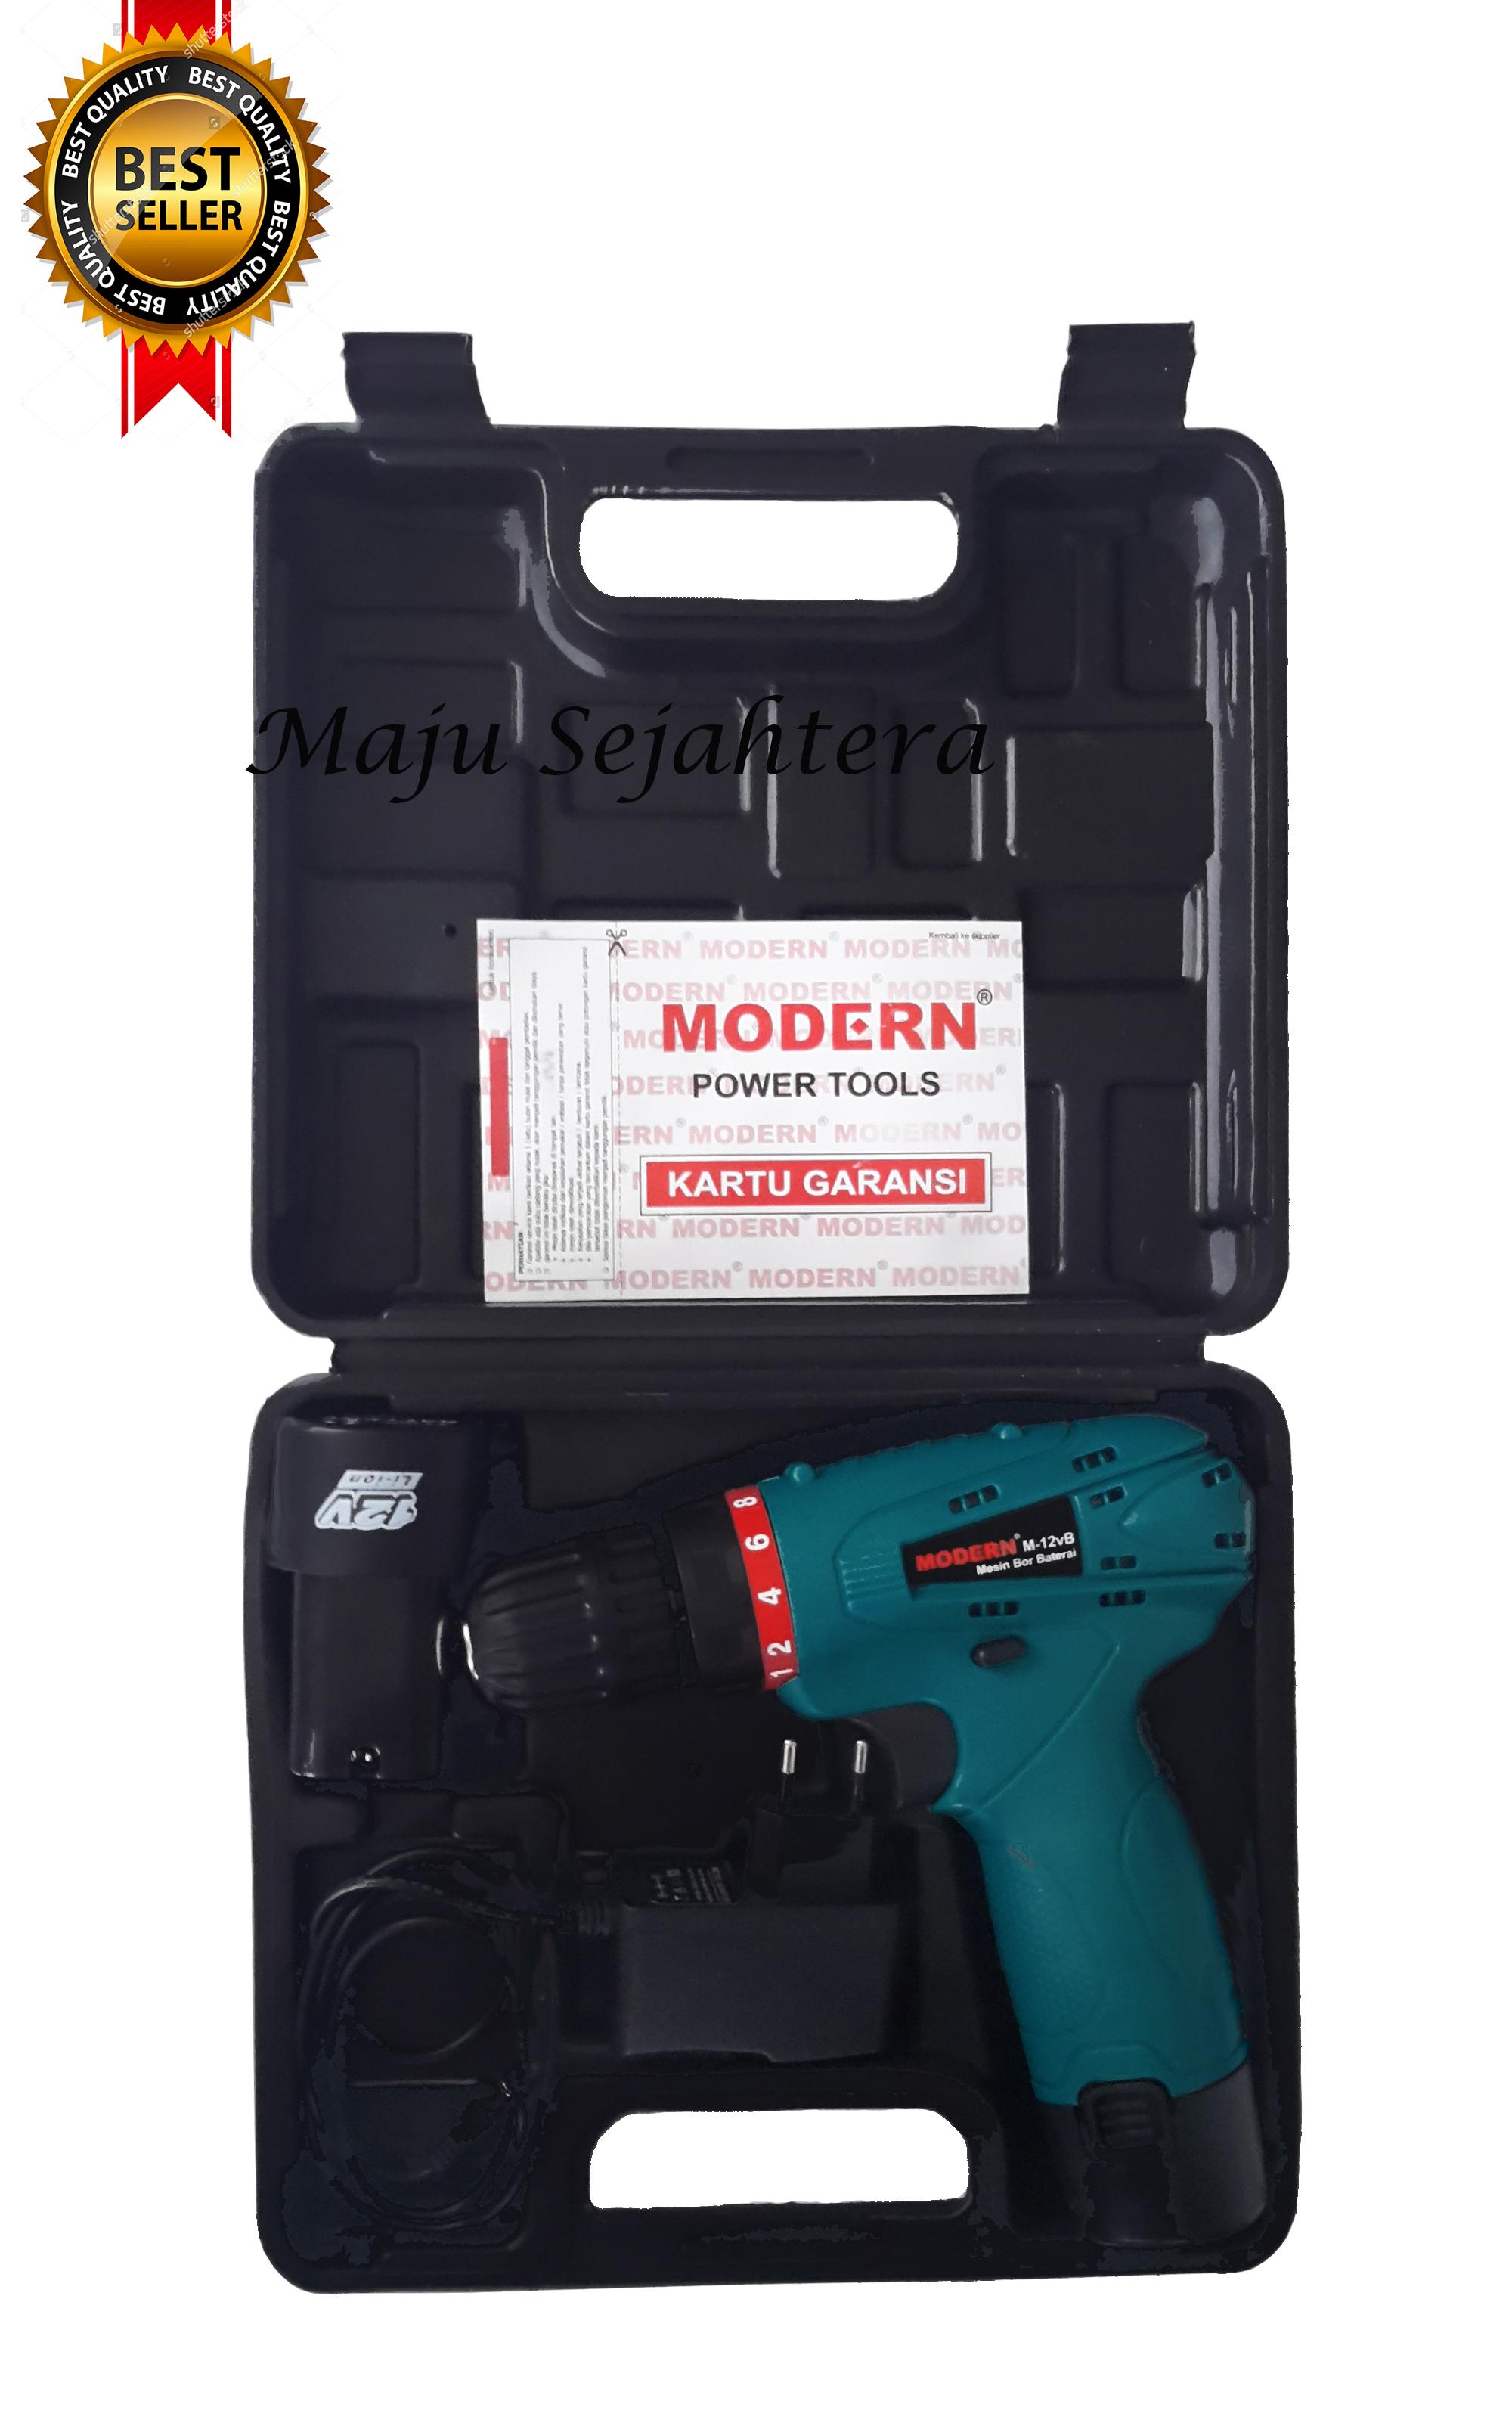 Mesin Bor Cordless 12V Modern, Mesin Bor Charger